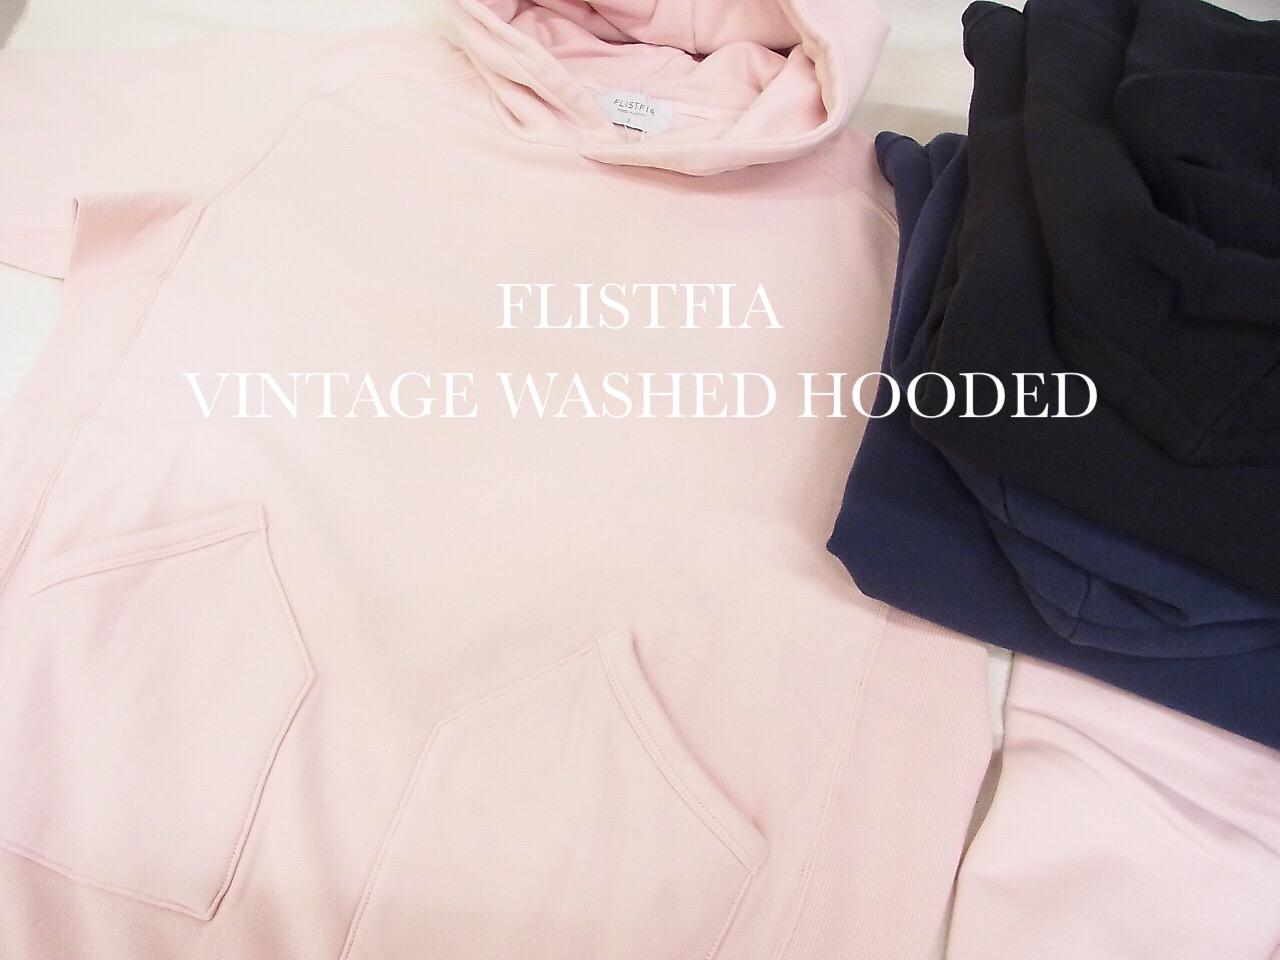 flistfia-vintagewashedhooded-20210906-1